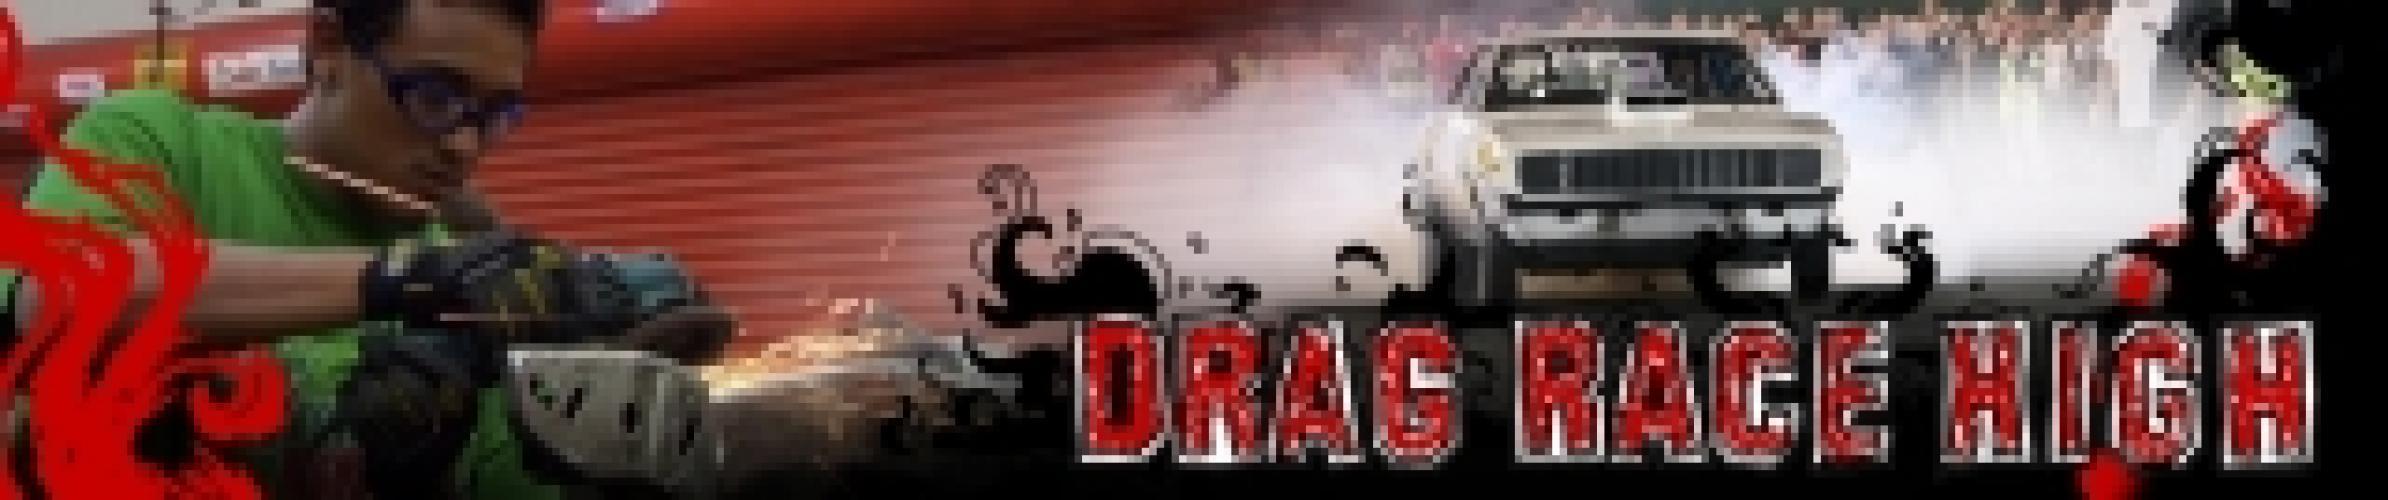 Drag Race High next episode air date poster